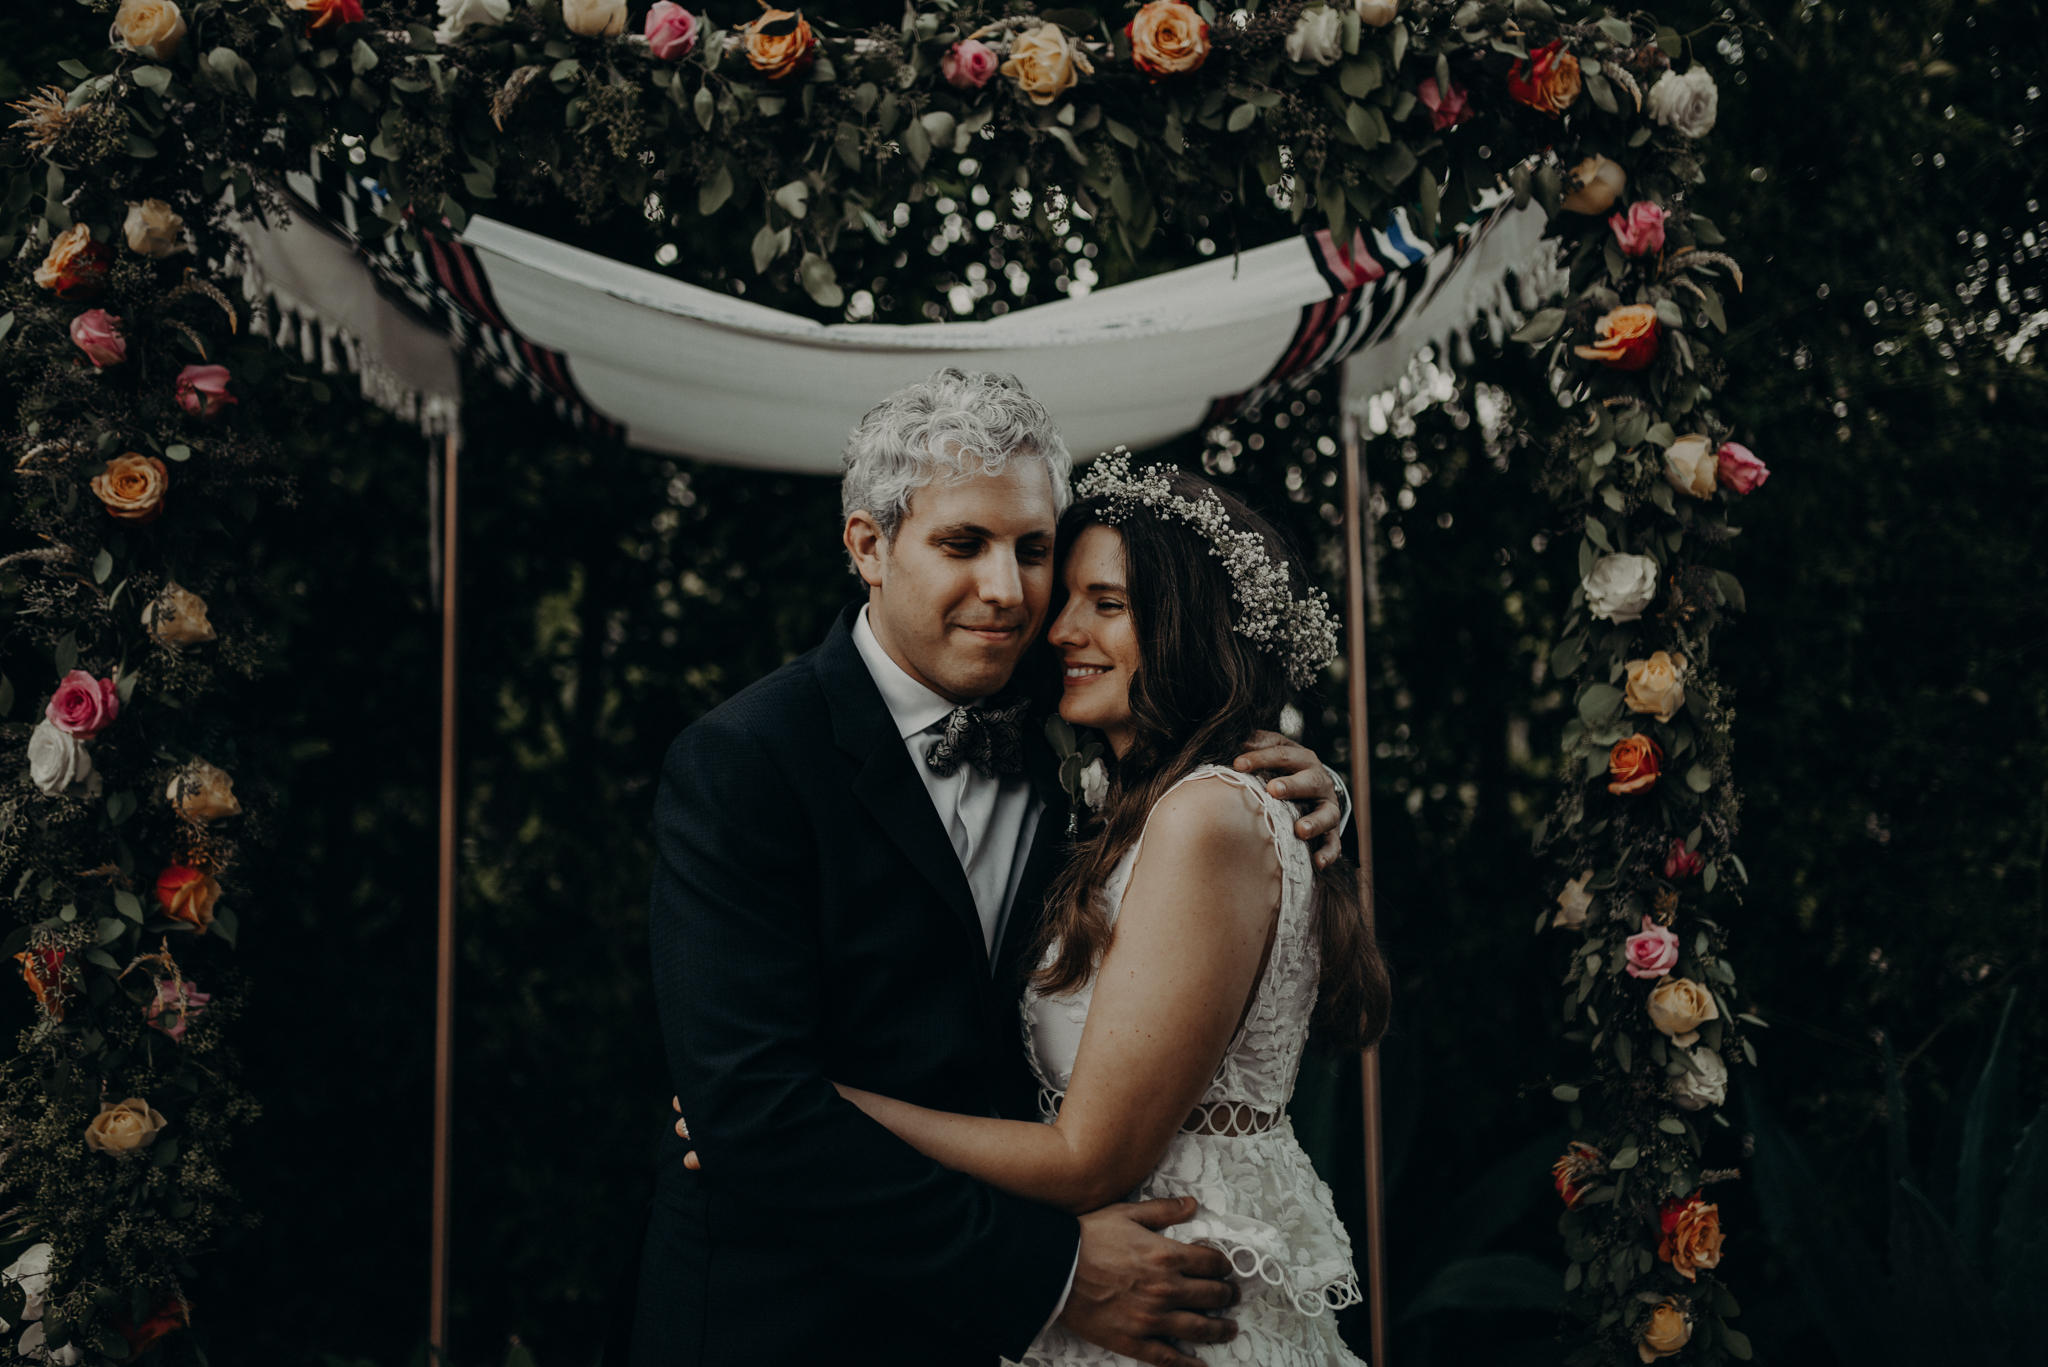 Isaiah + Taylor Photography - Private Estate Backyard Wedding - Beverly Hills - Los Angeles Wedding Photographer - 94.jpg